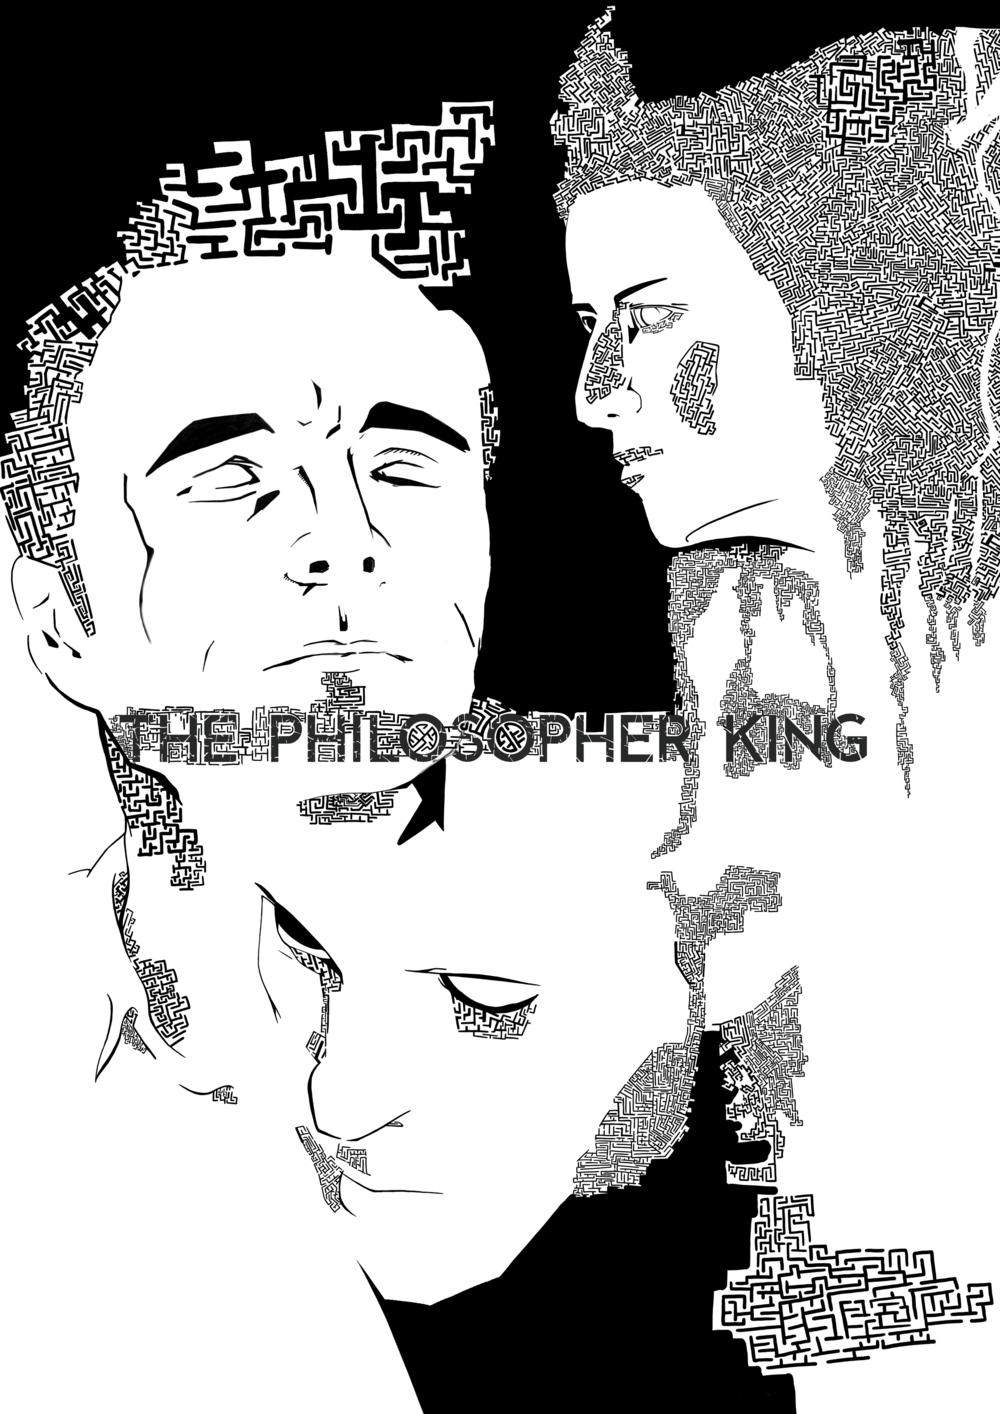 tpk-poster.png